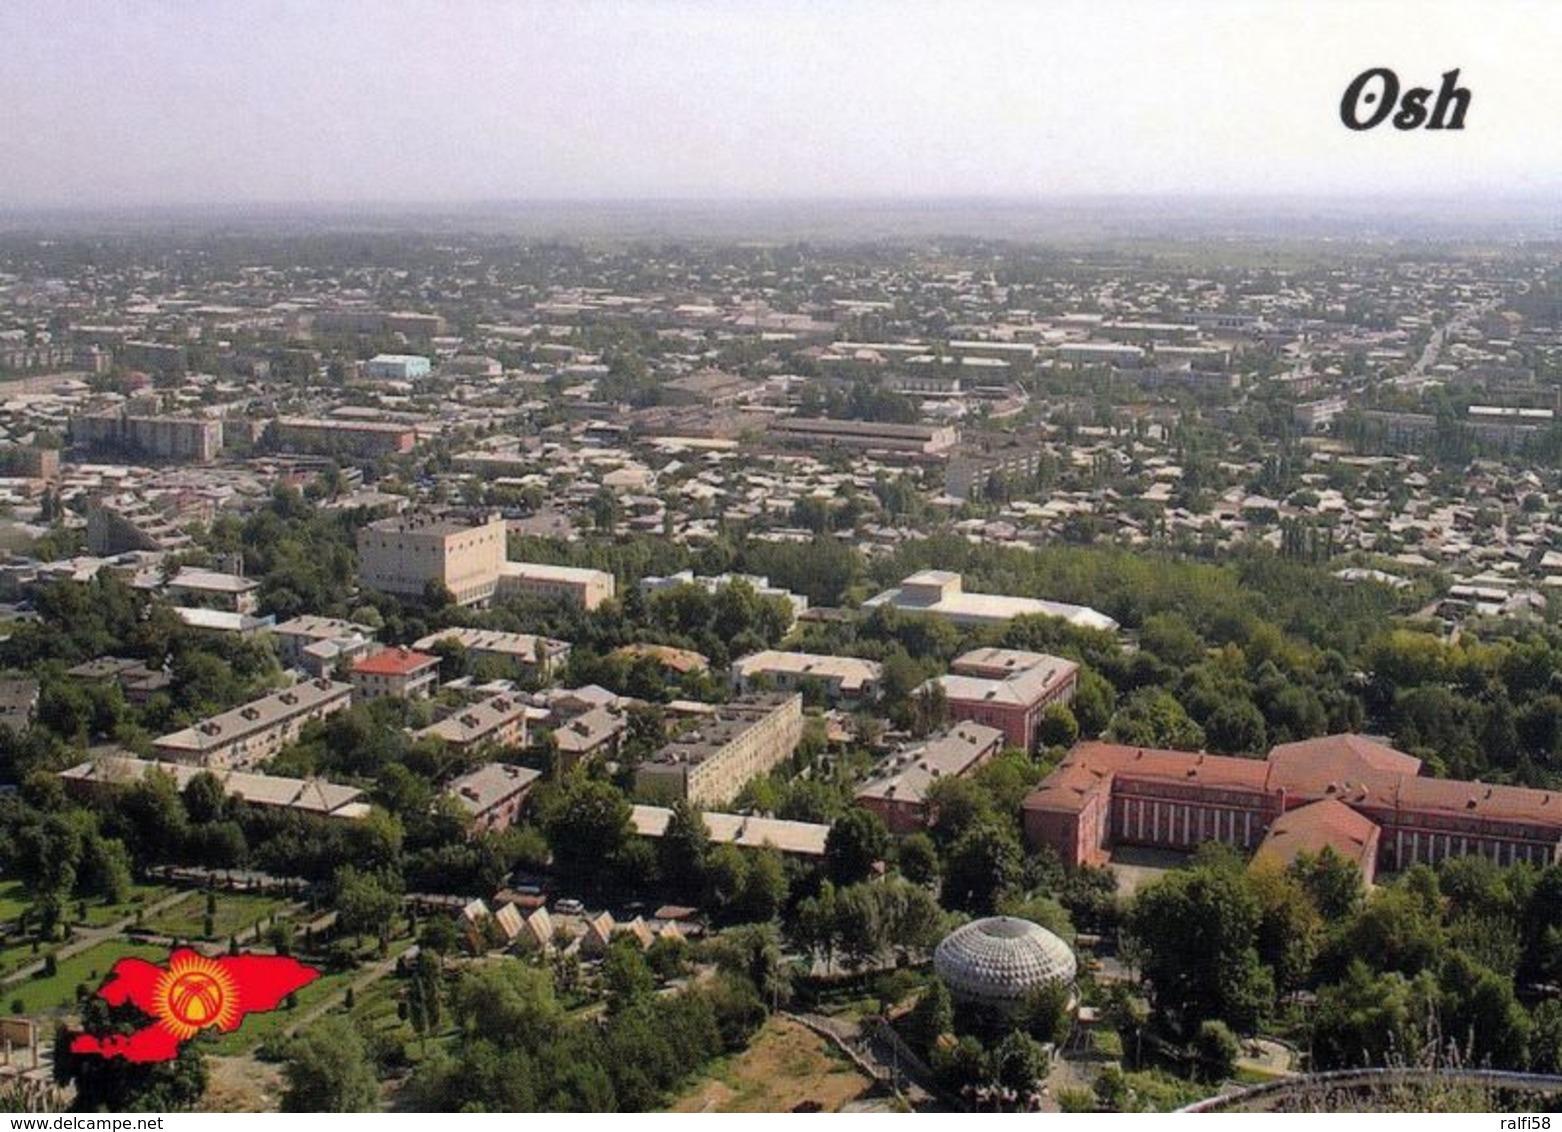 1 AK Kirgistan Kyrgyzstan * Blick Auf Die Stadt Osh (Osch) - Luftbildaufnahme * - Kirgisistan